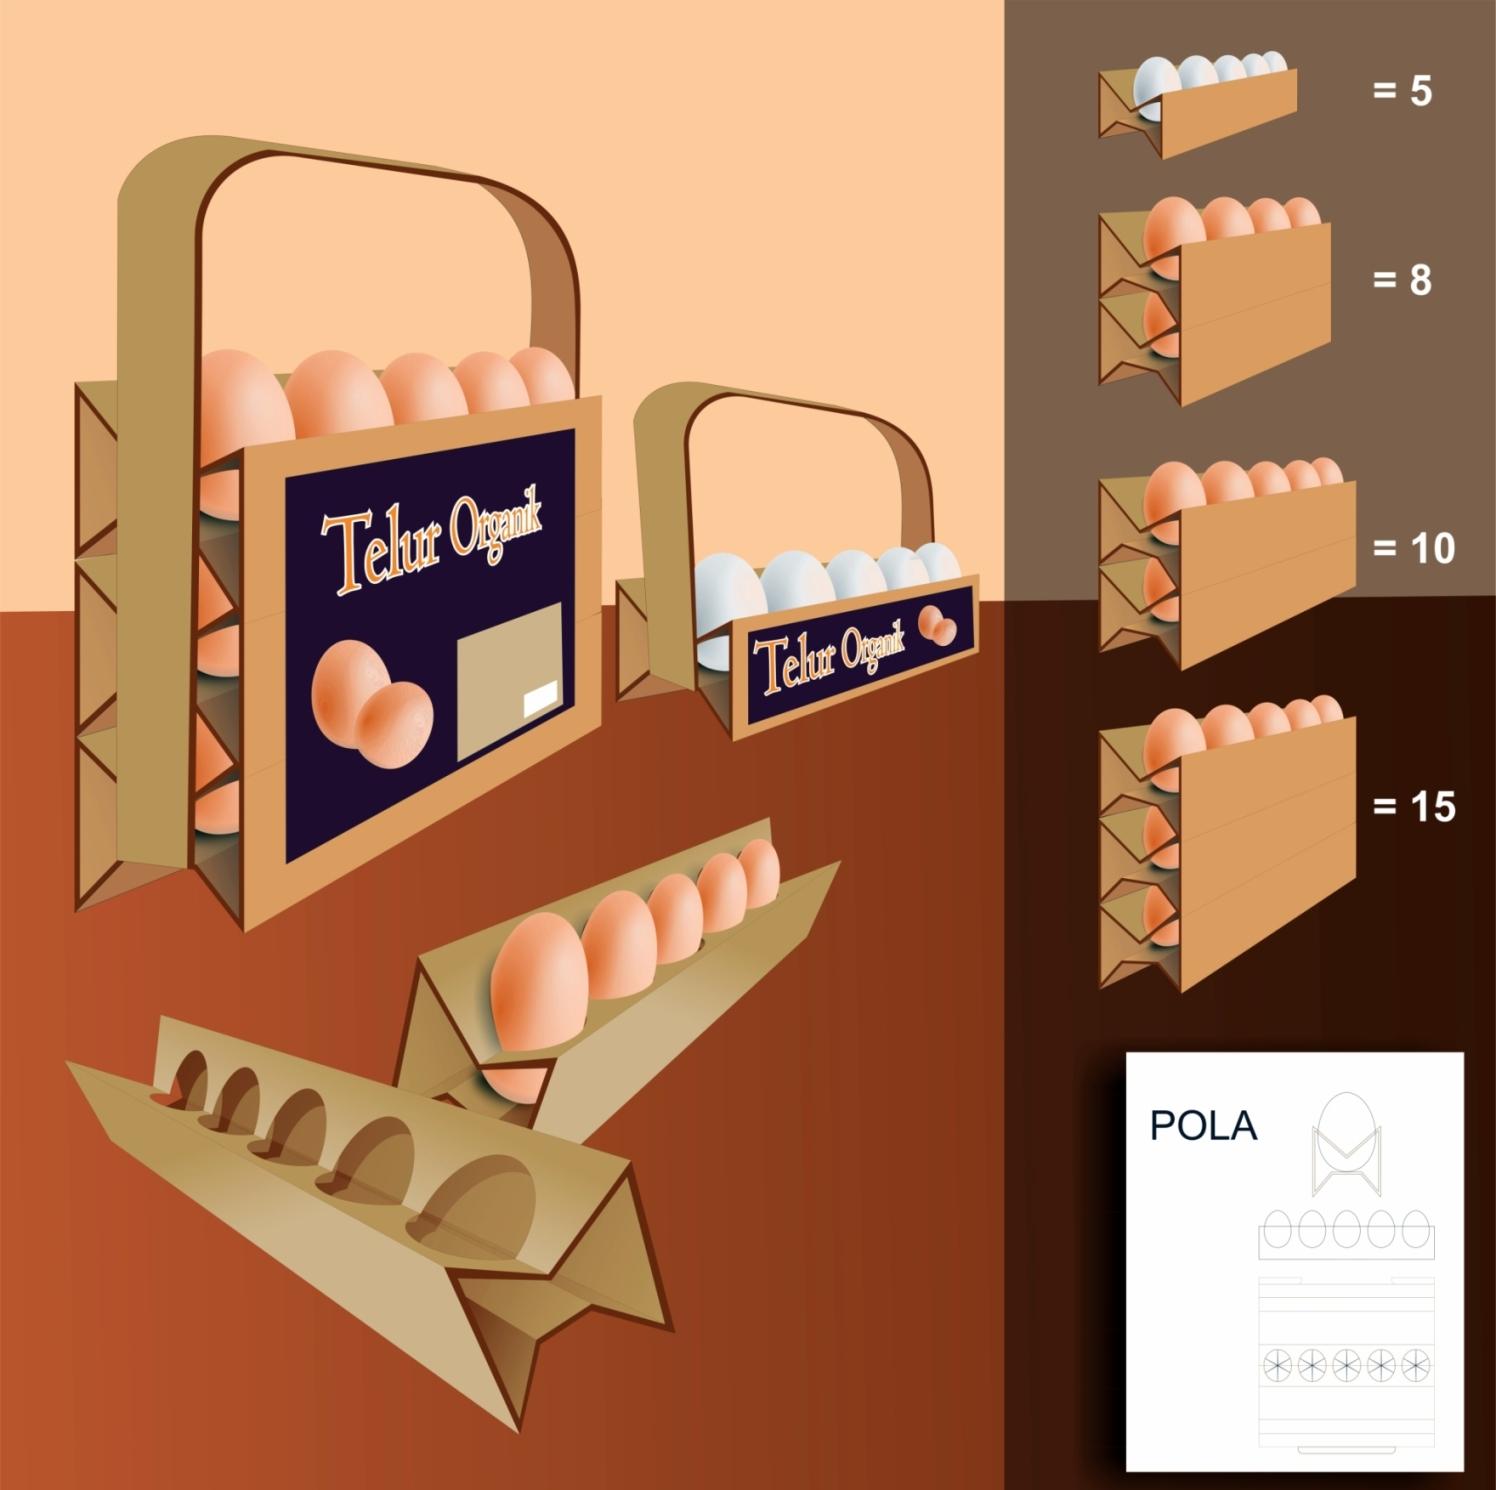 Sribu: Desain Kemasan - Desain Kemasan Dus Untuk Produk Telu